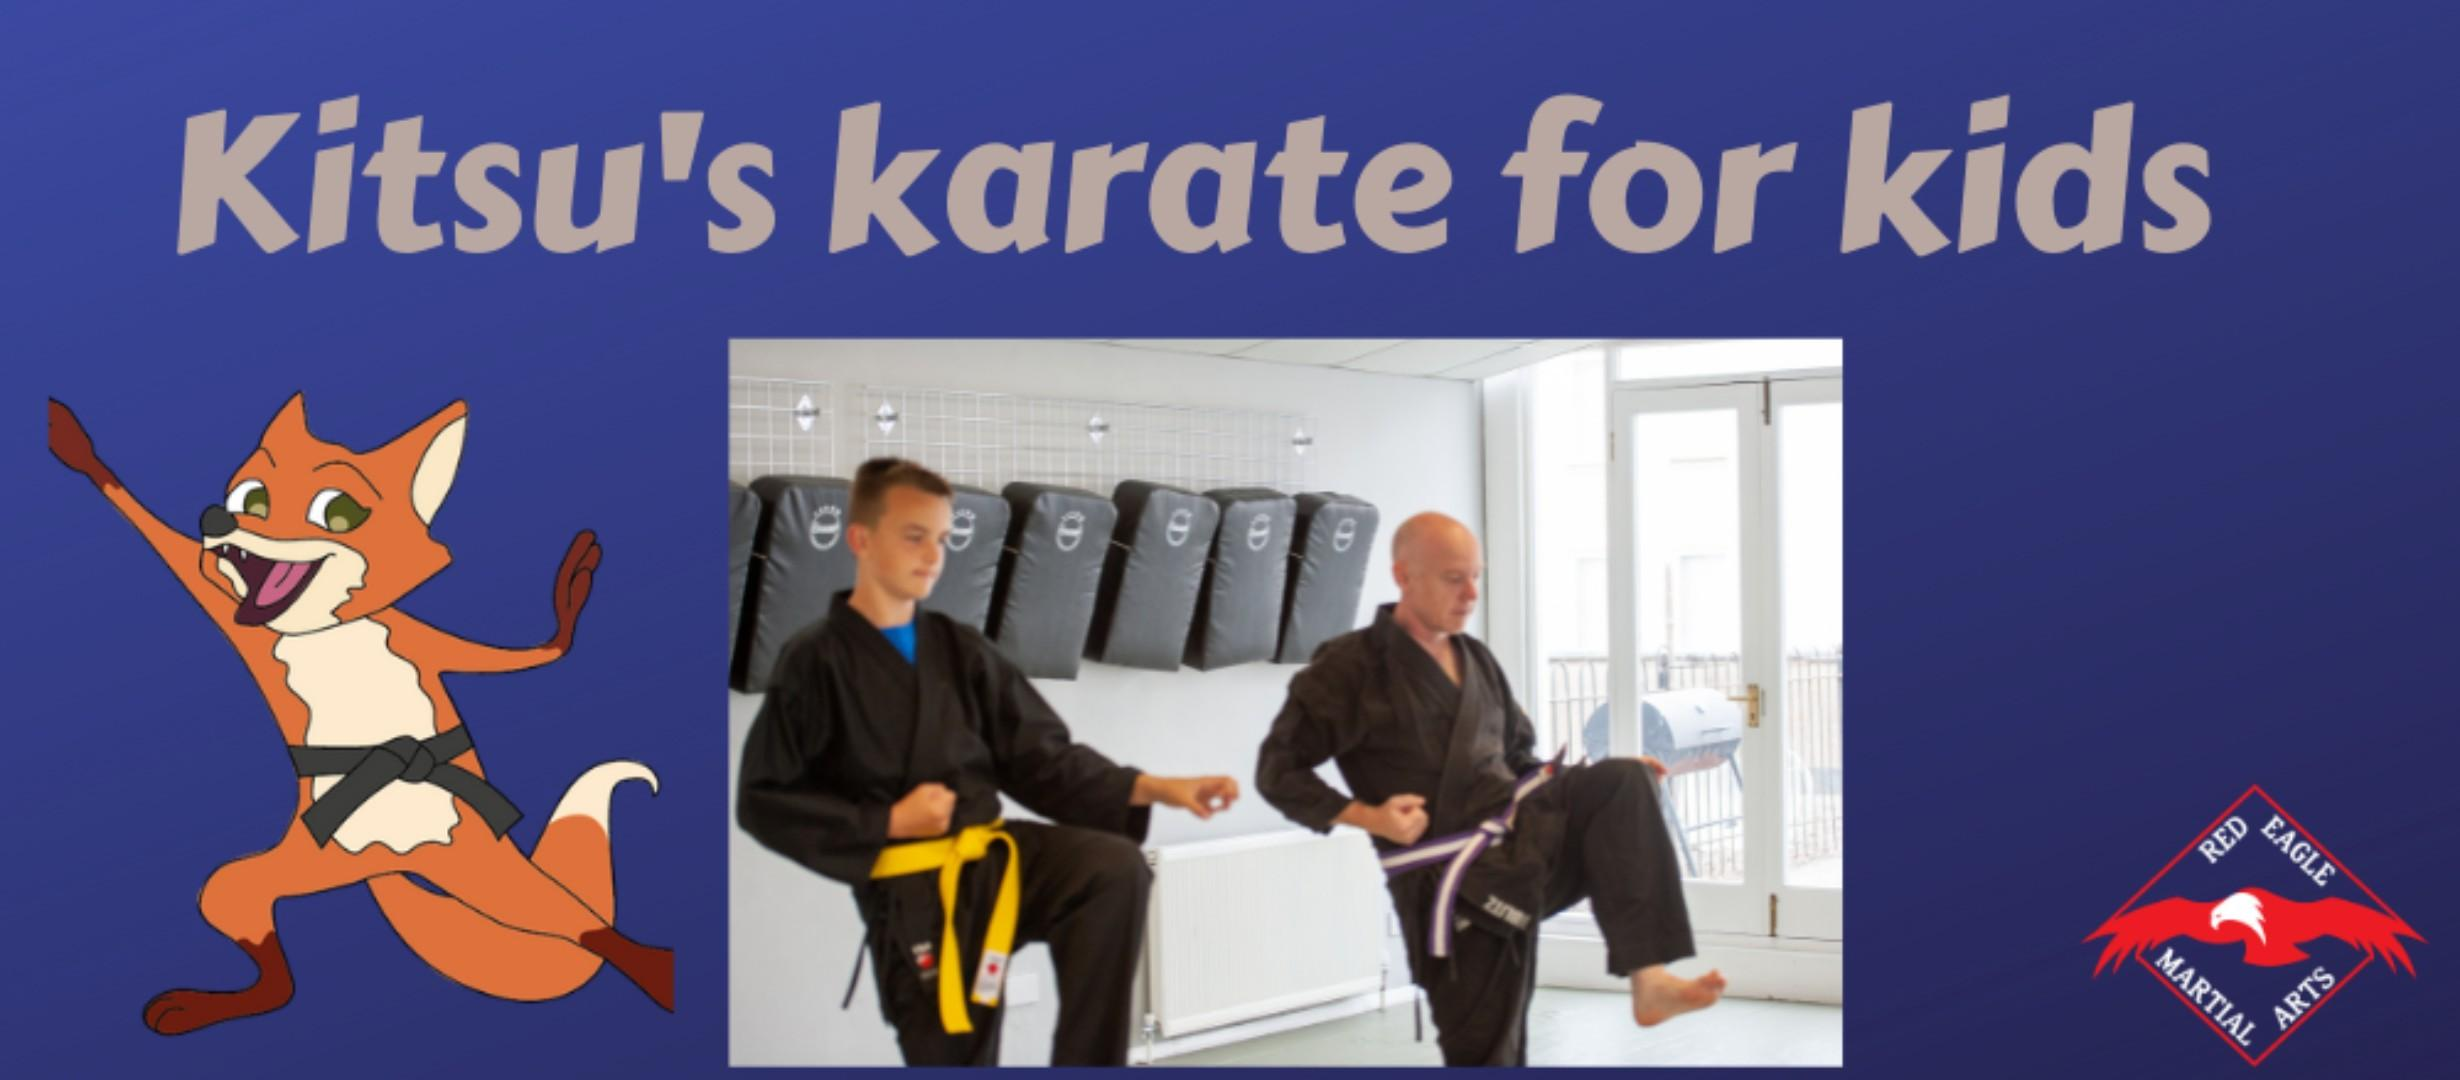 Kitsu's Karate for Kids - Junior karate student training